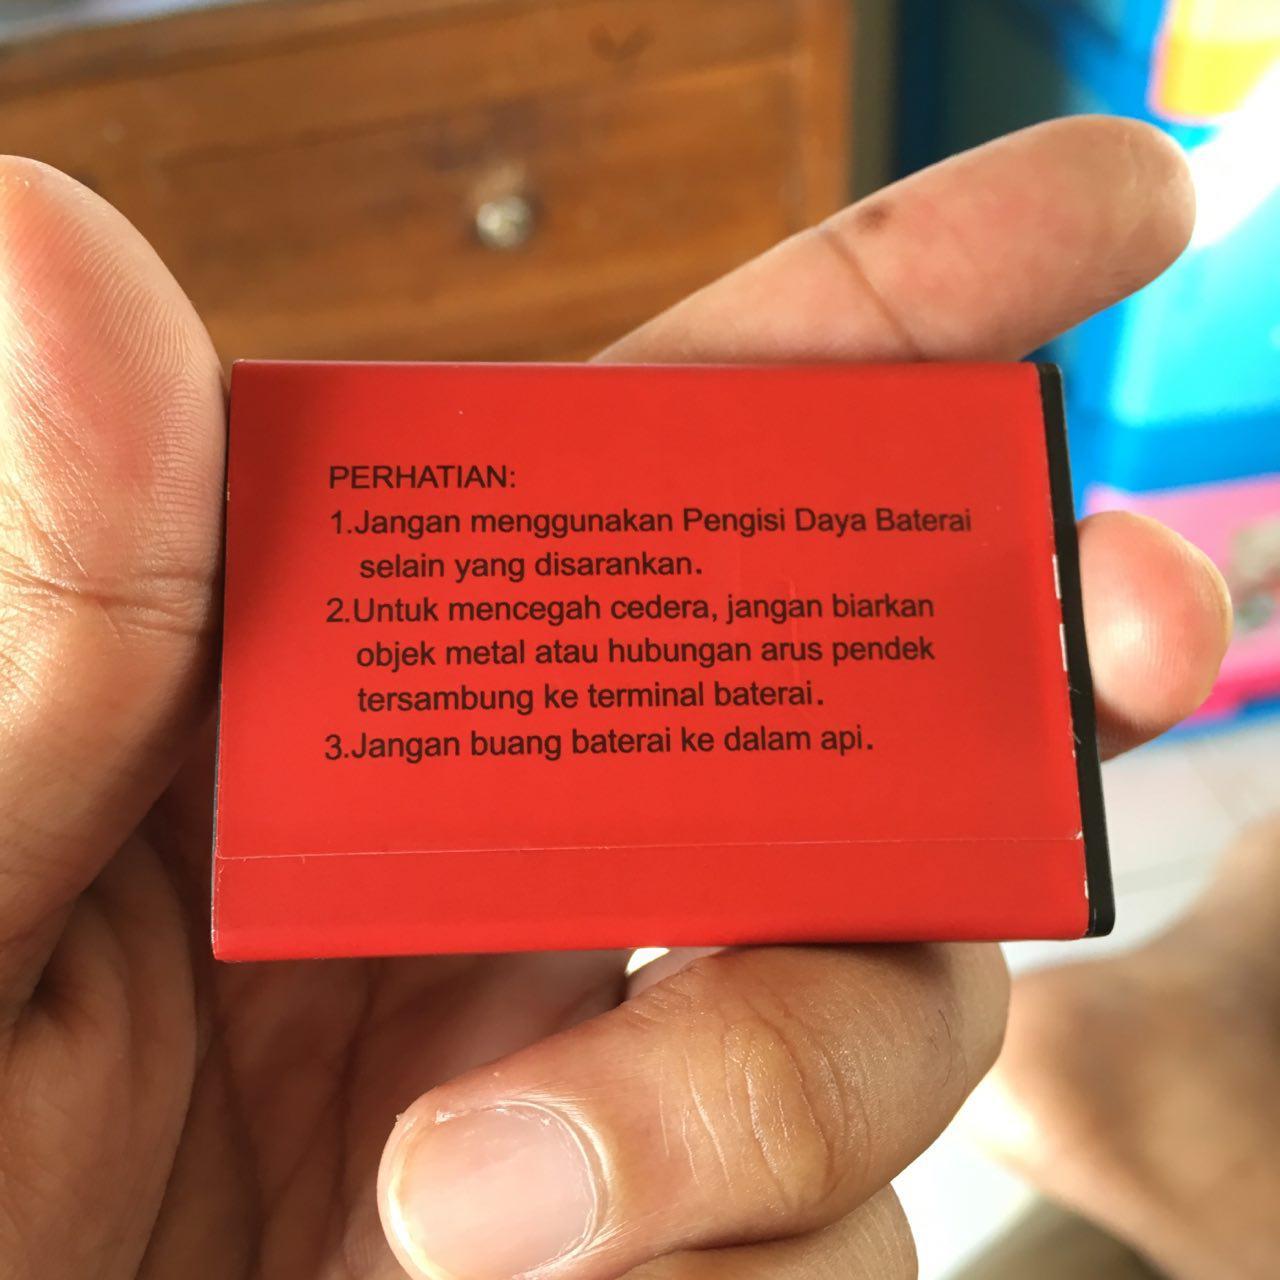 Sisi belakang Baterai Smartfren Modem 4G LTE M2Y